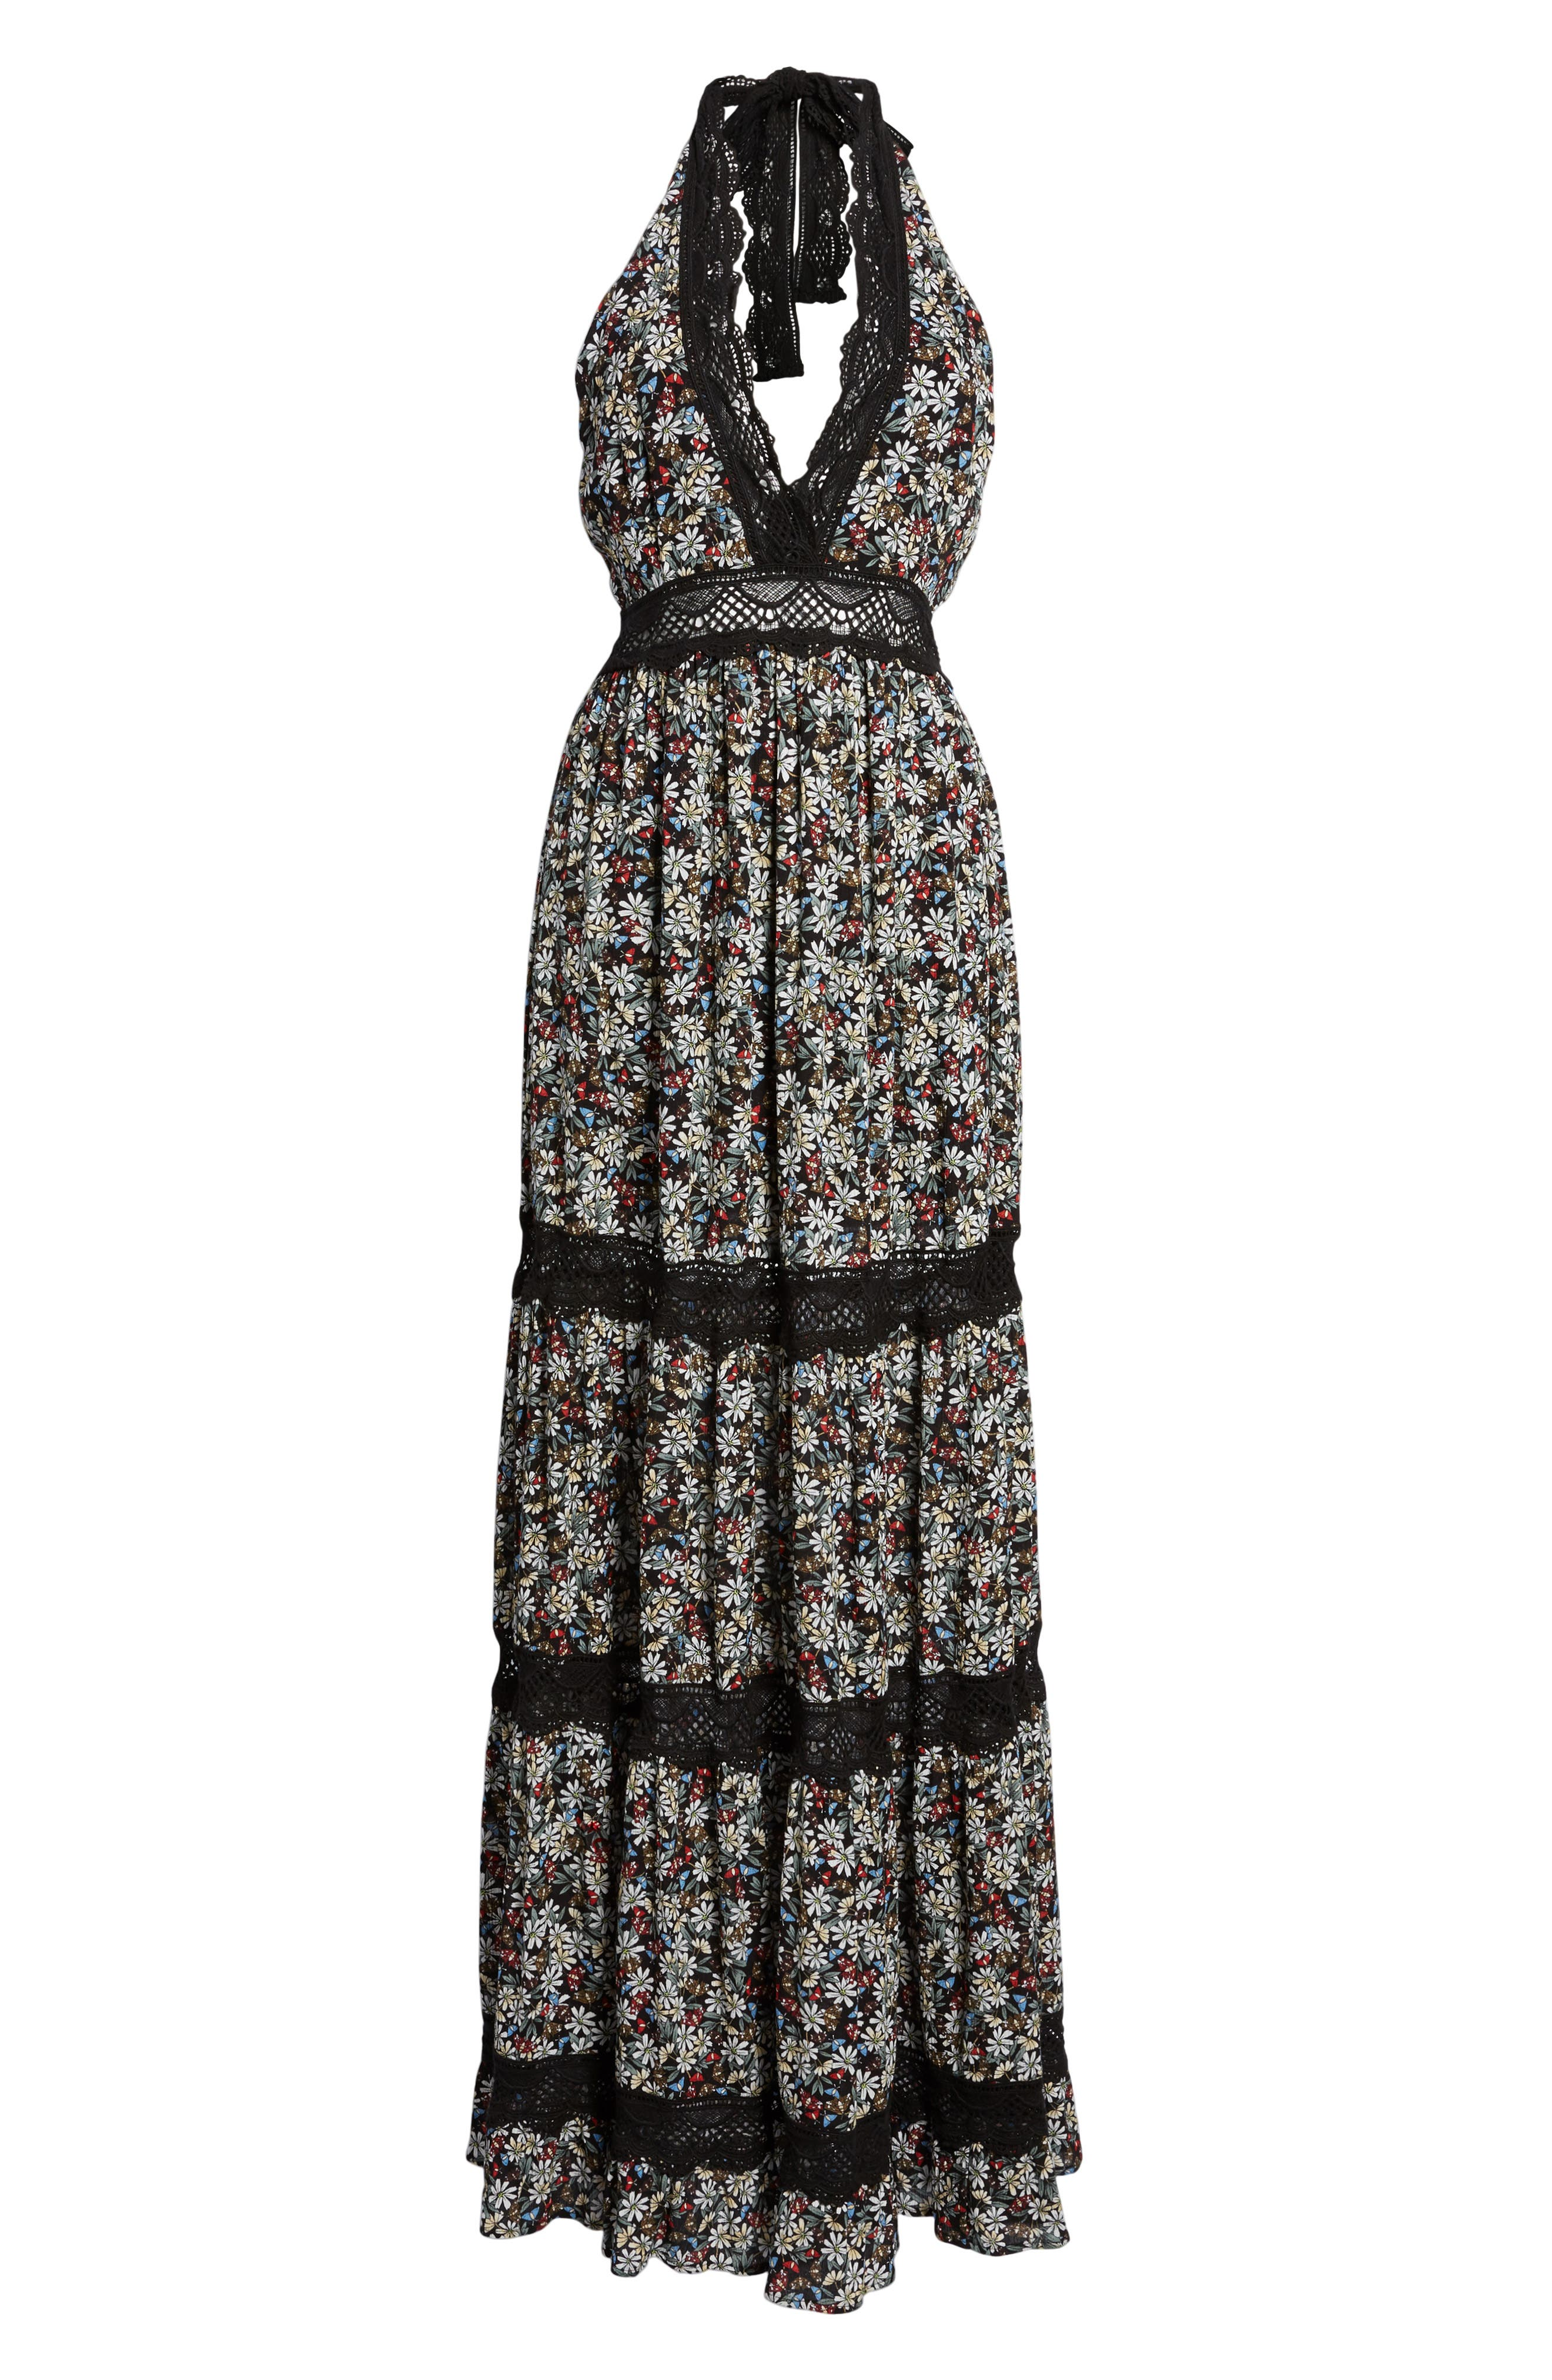 Flora Halter Neck Maxi Dress,                             Alternate thumbnail 6, color,                             004